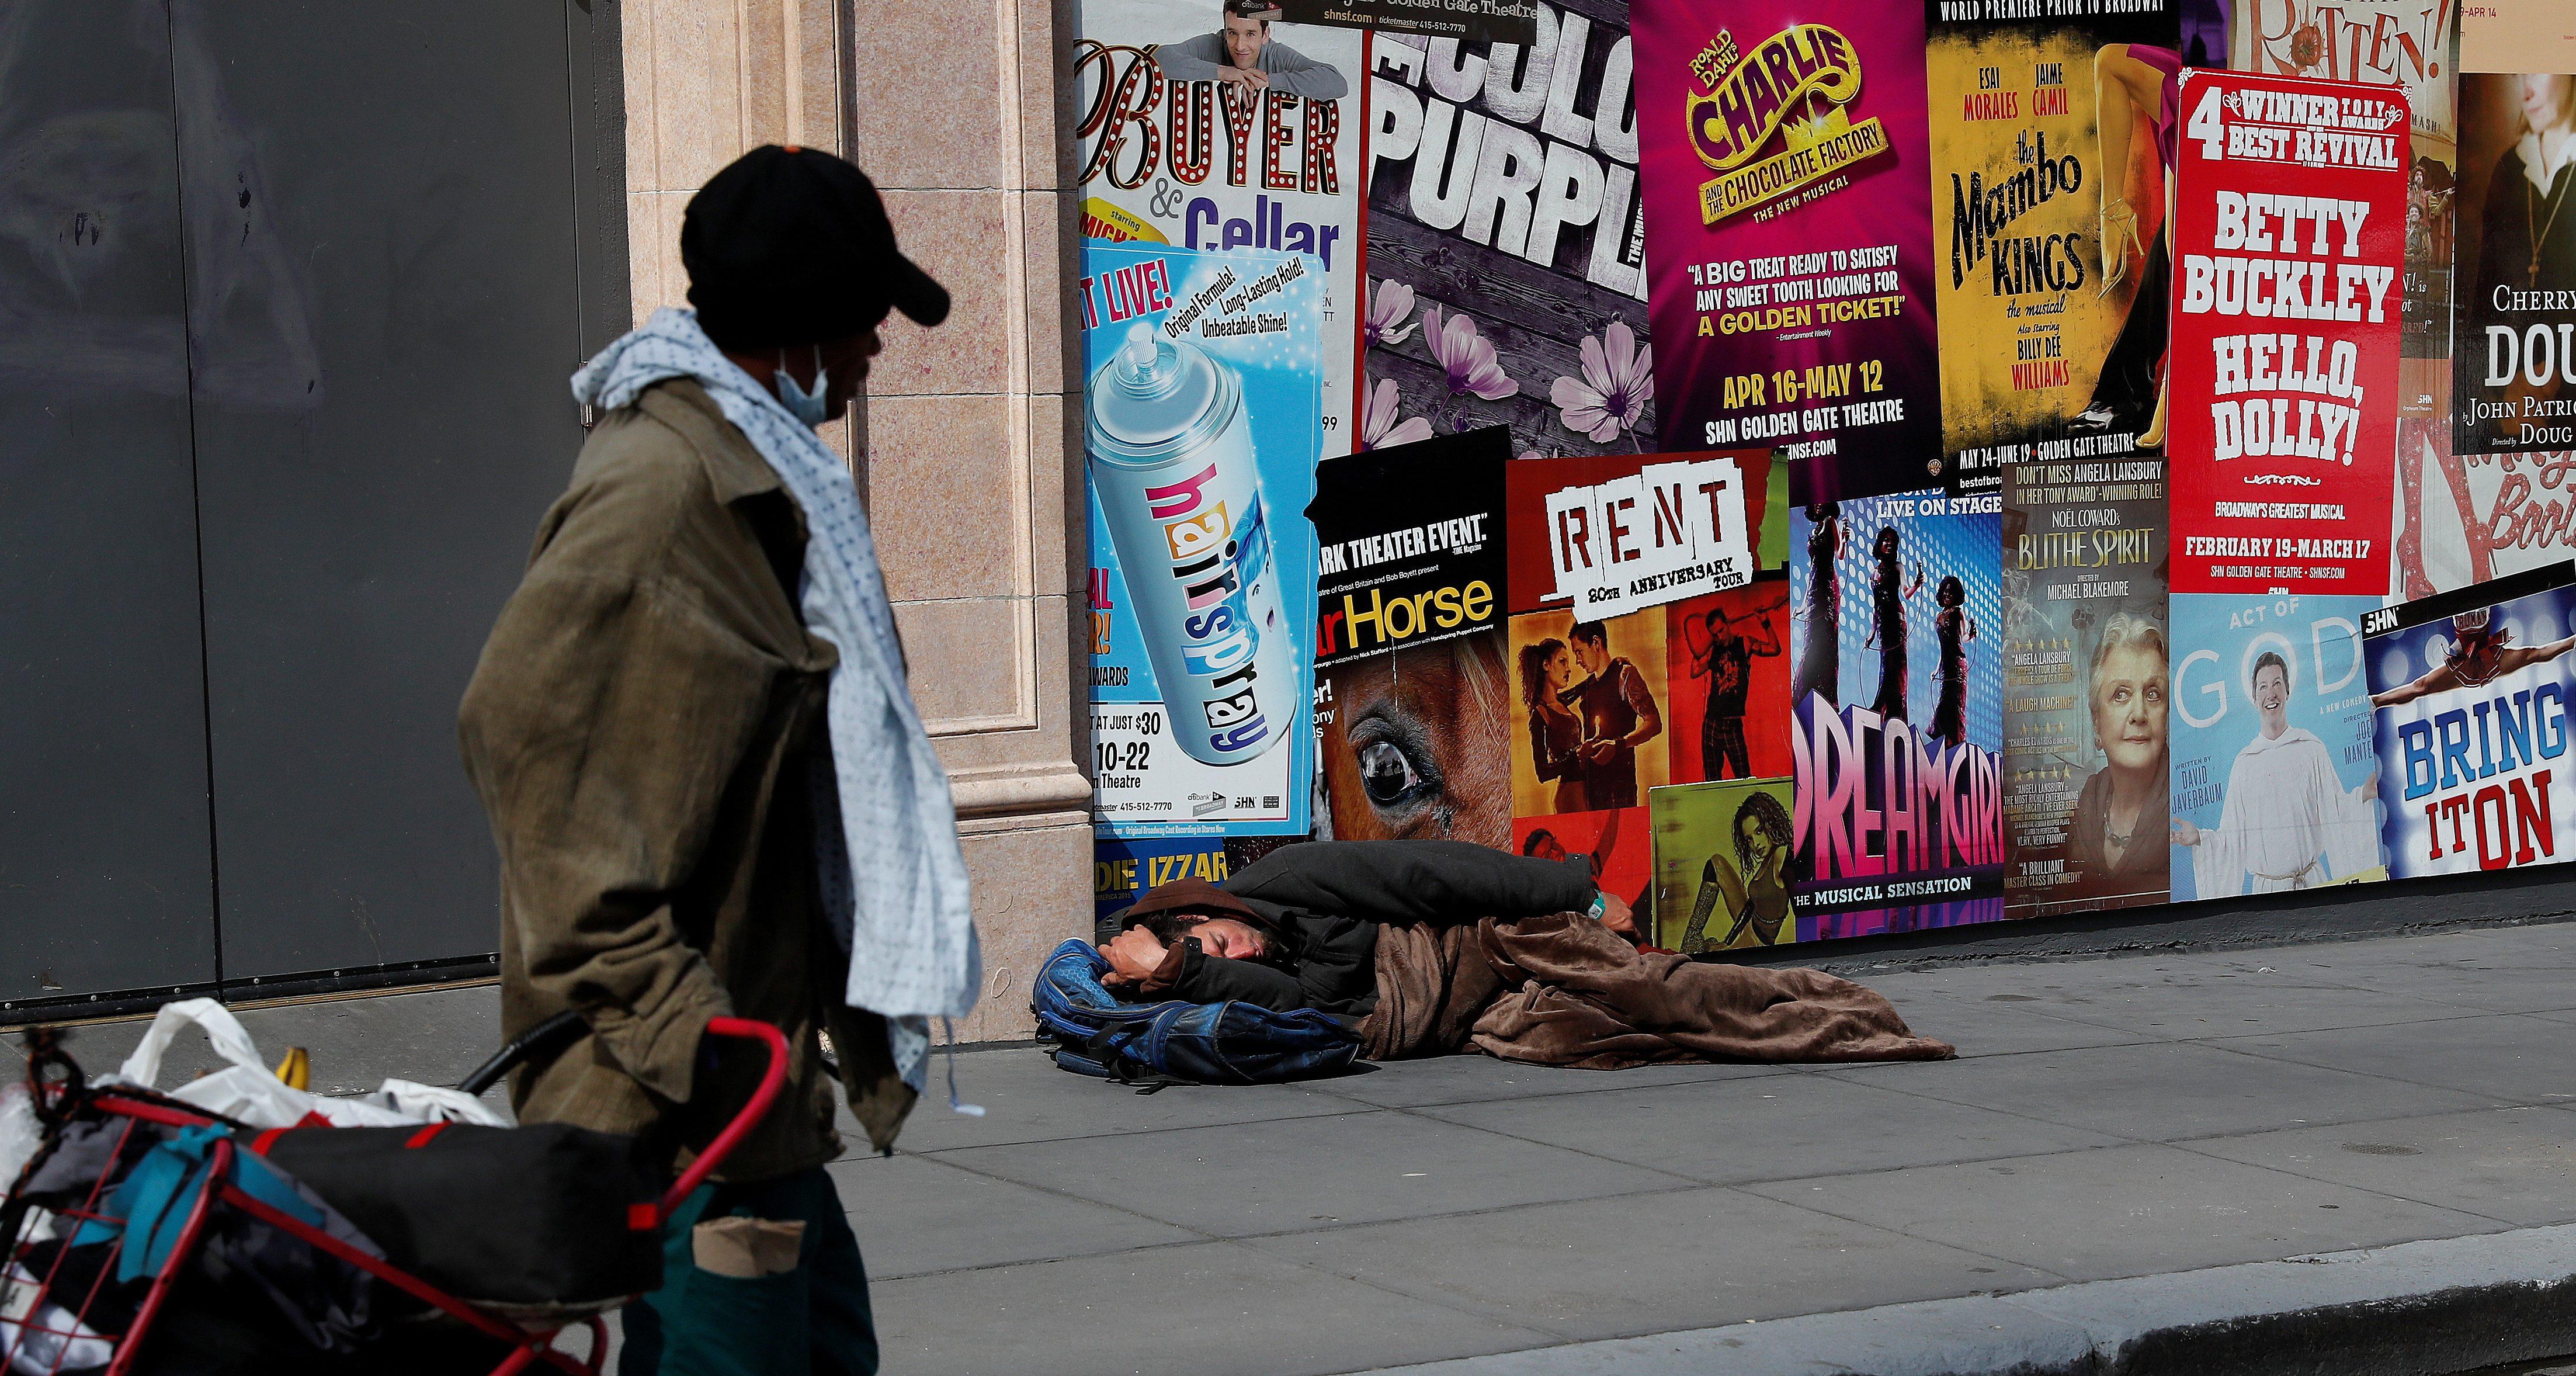 Homeless men in San FRancisco. The US trails in many social progress metrics.